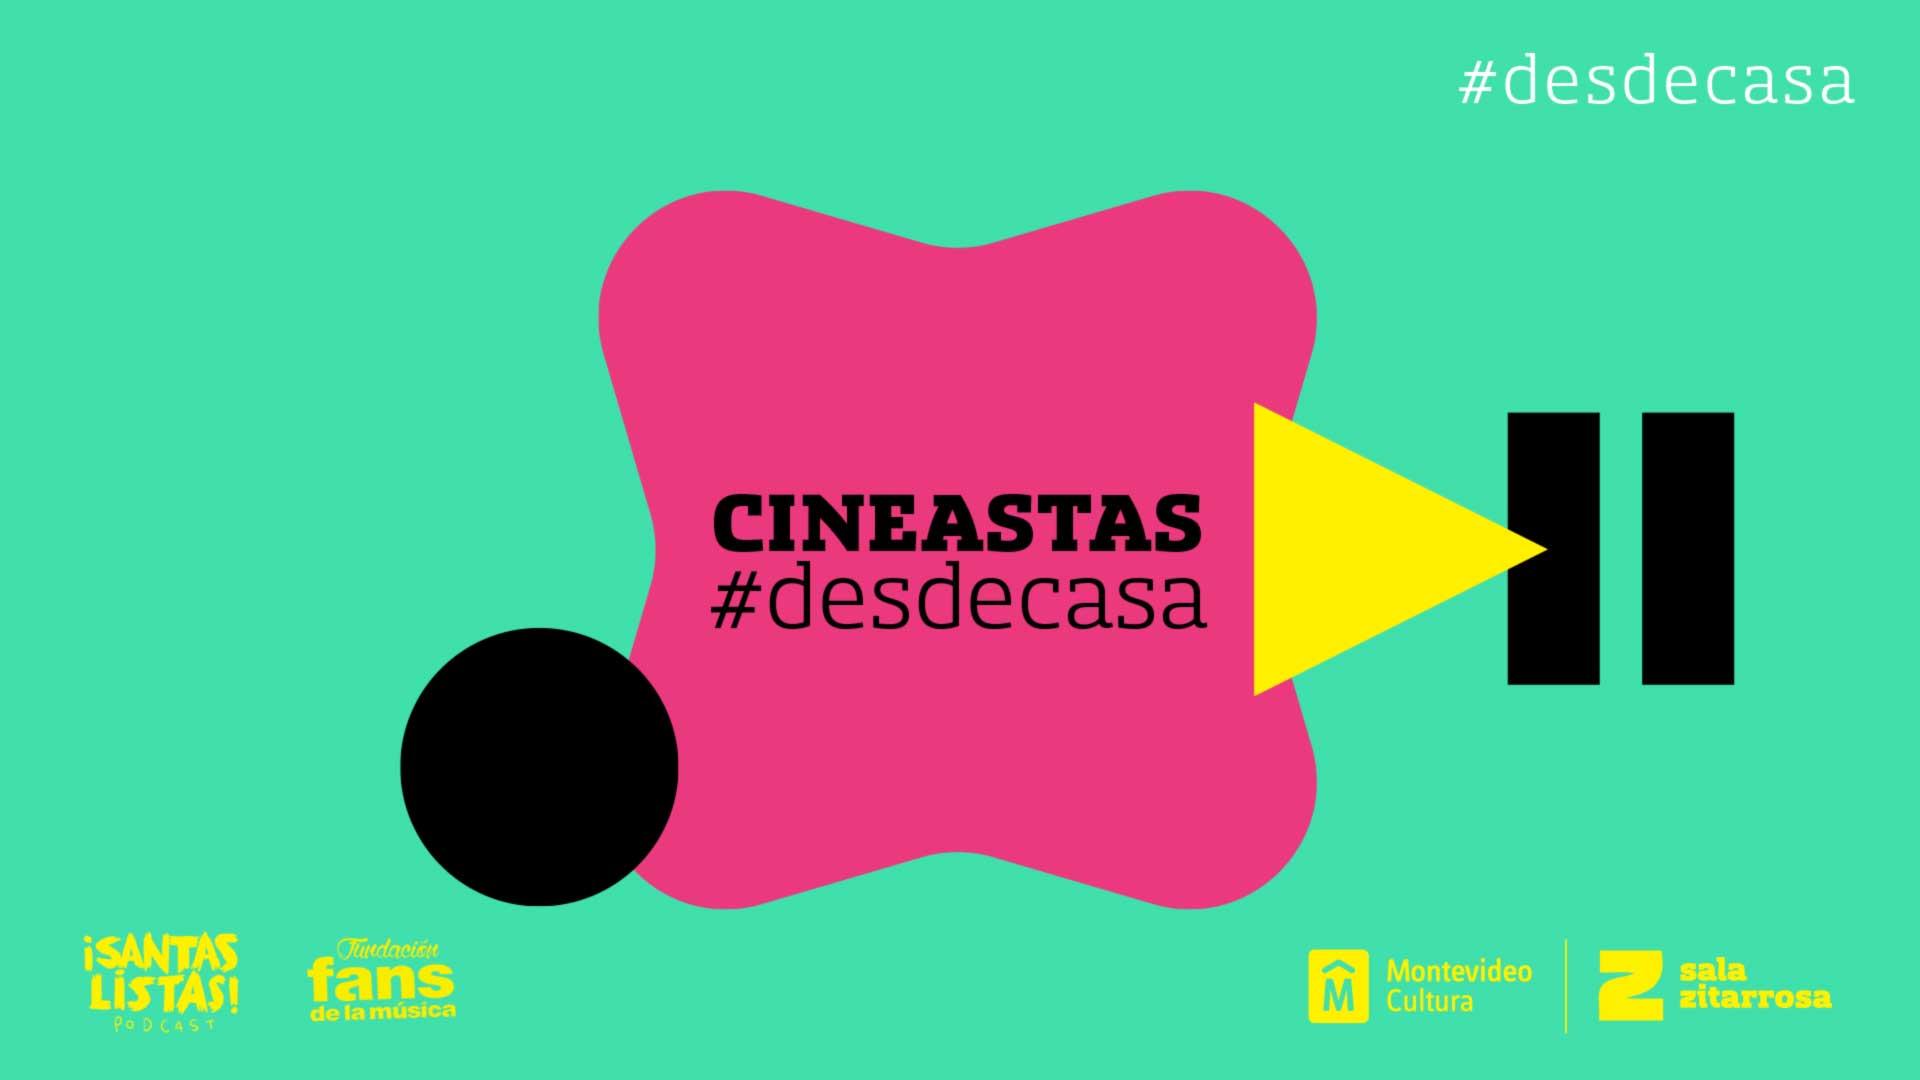 Cineastas #desdecasa